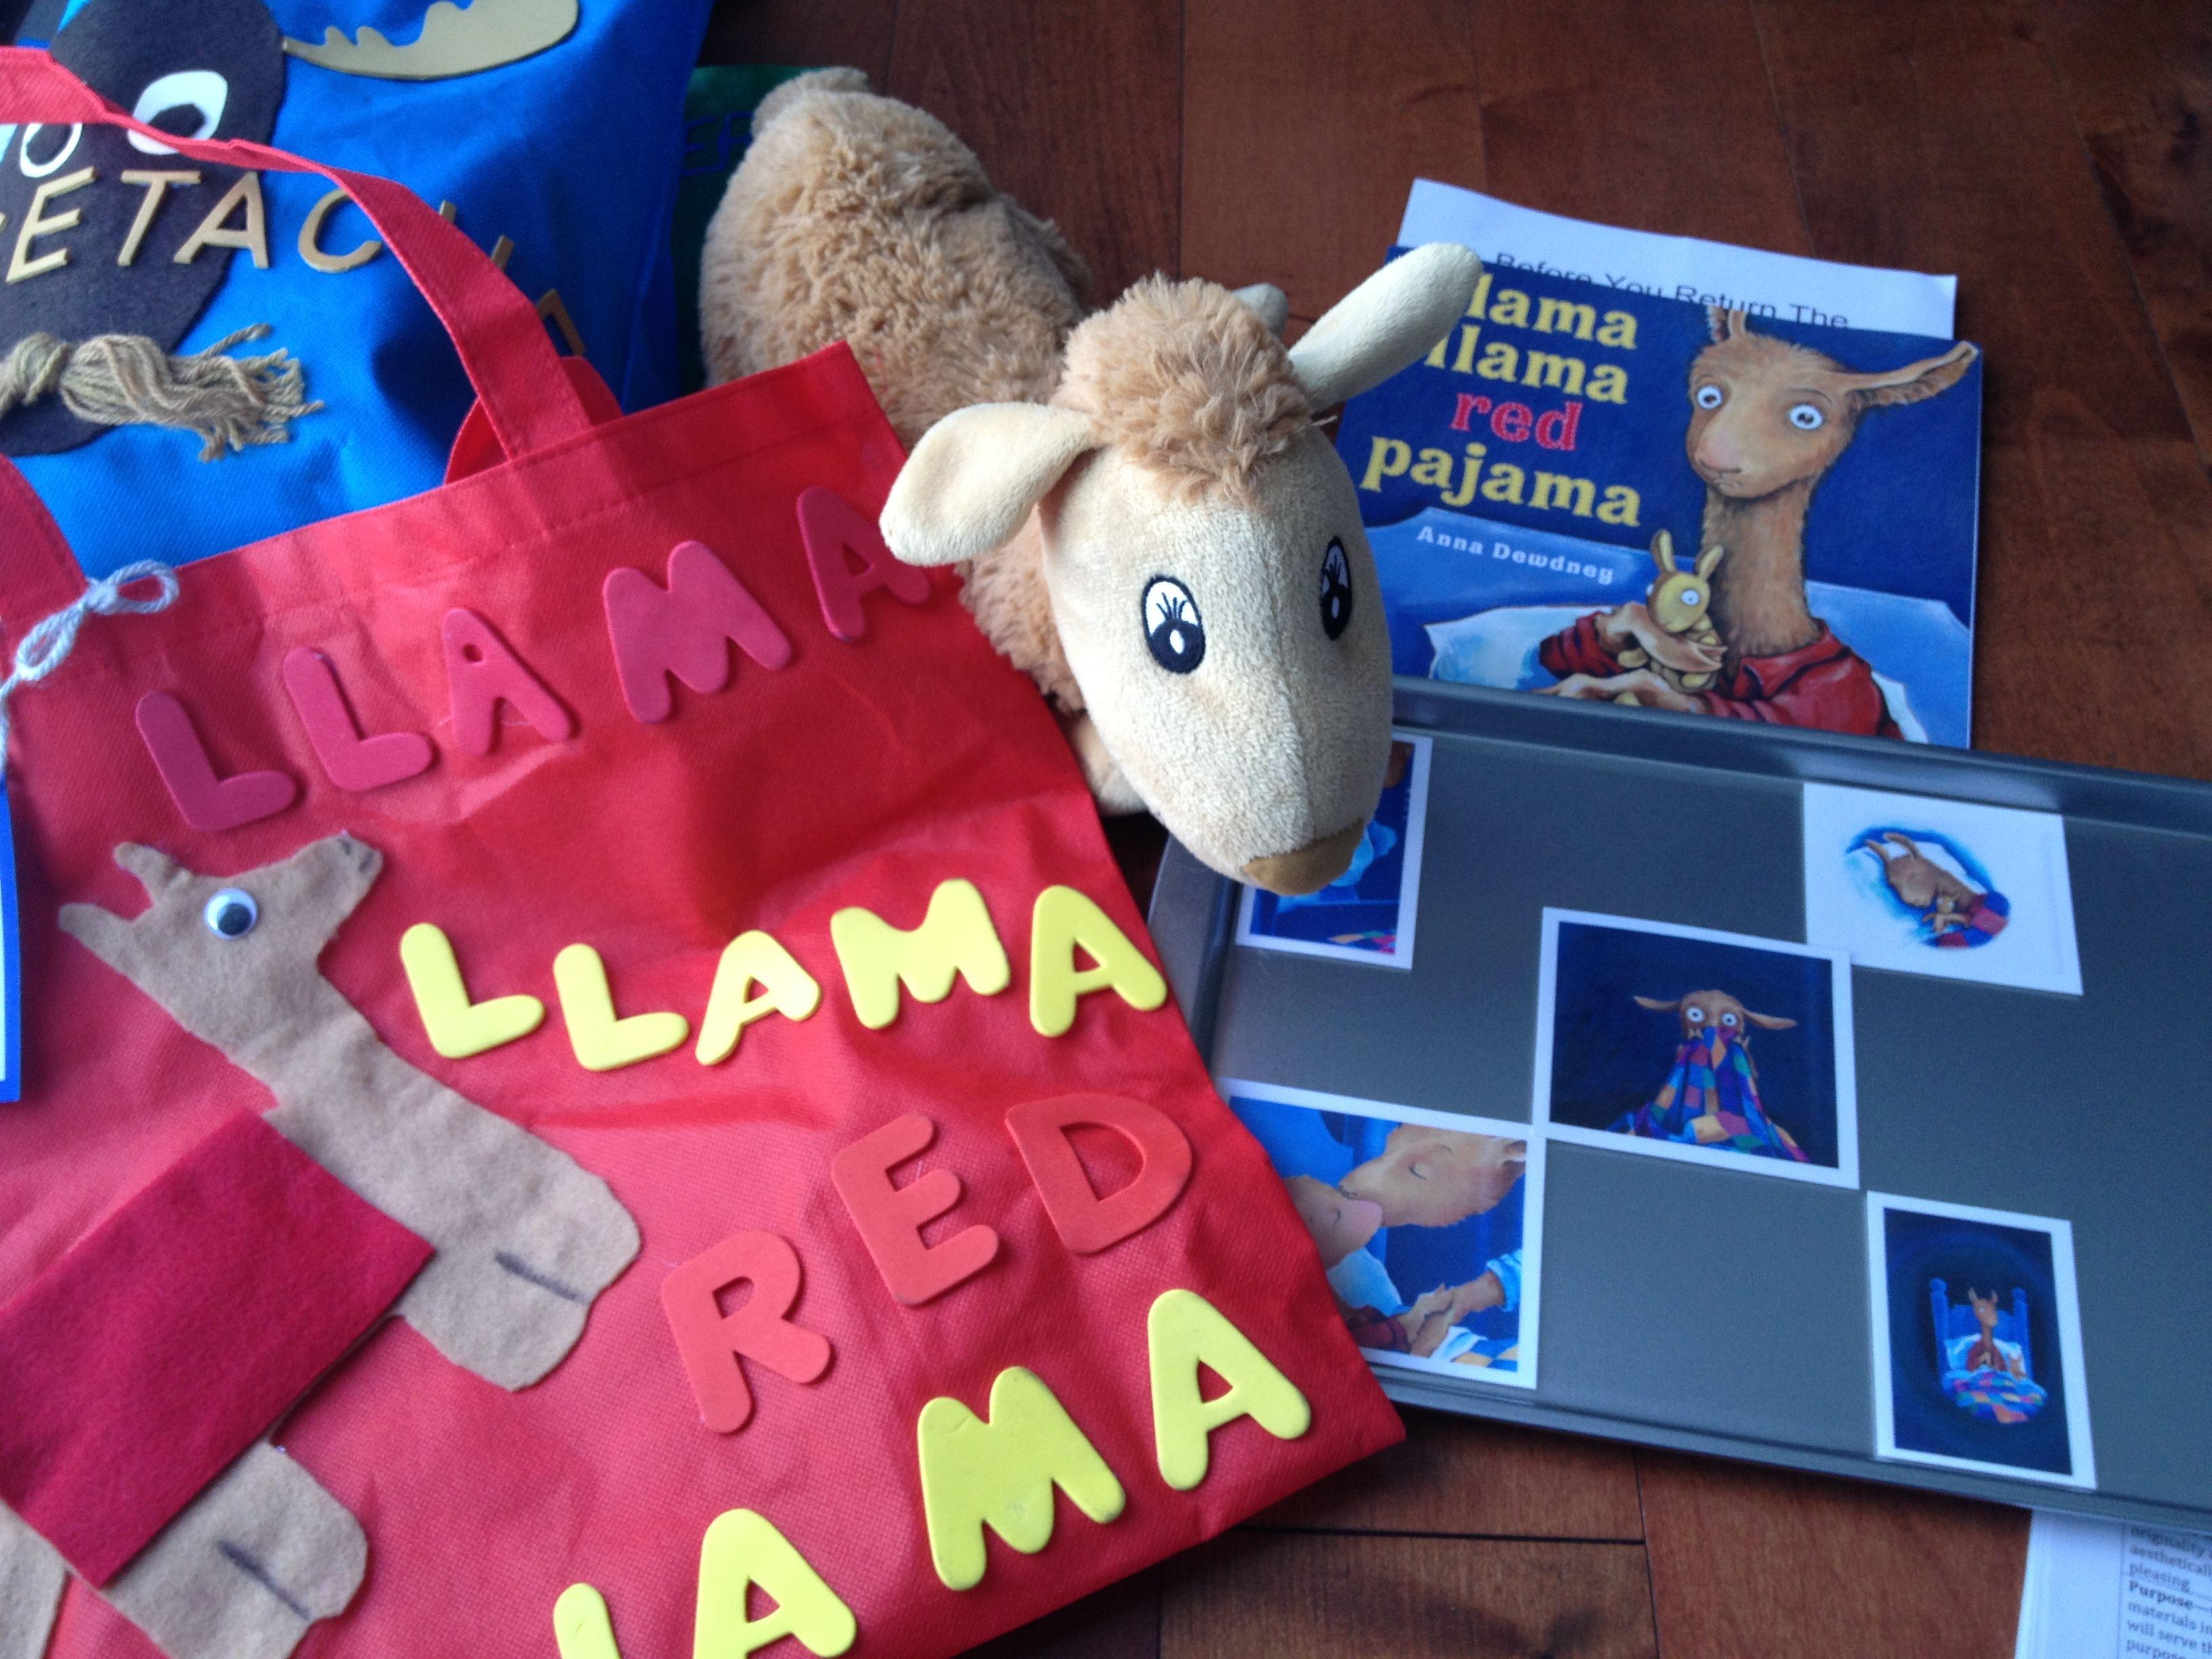 Llama Llama Red Pajama Reading Activity Based On Emotions